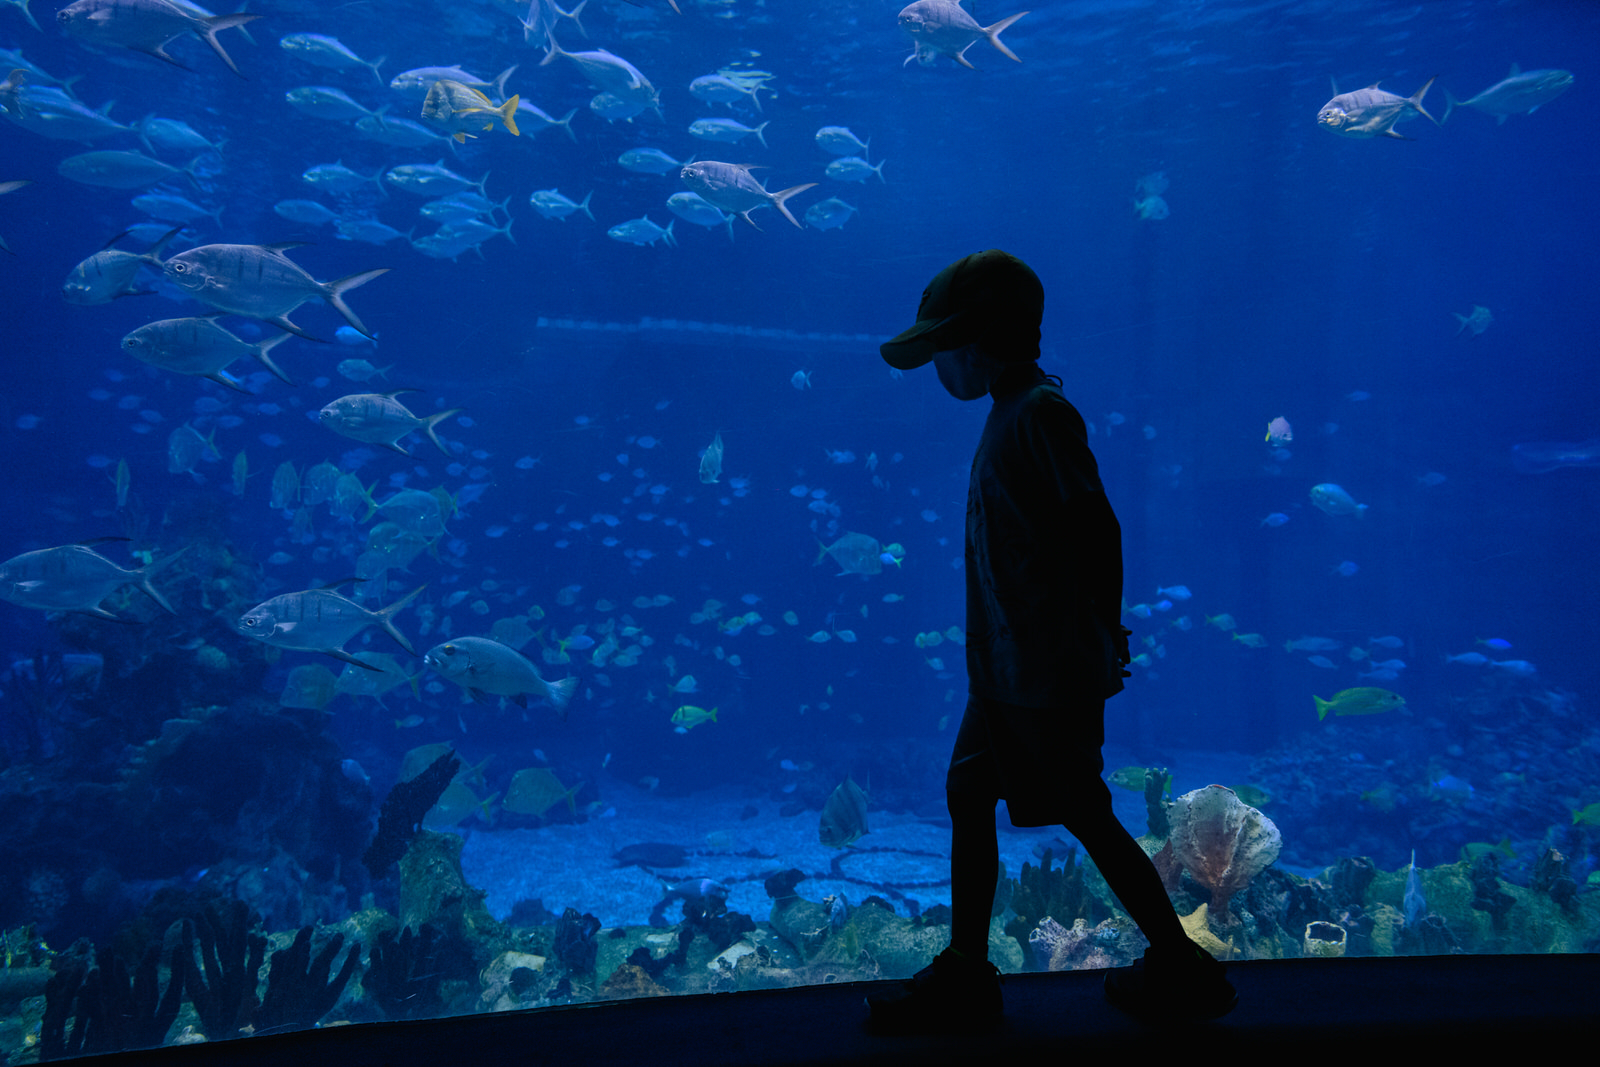 boys walks the aquarium past the hidden mickey